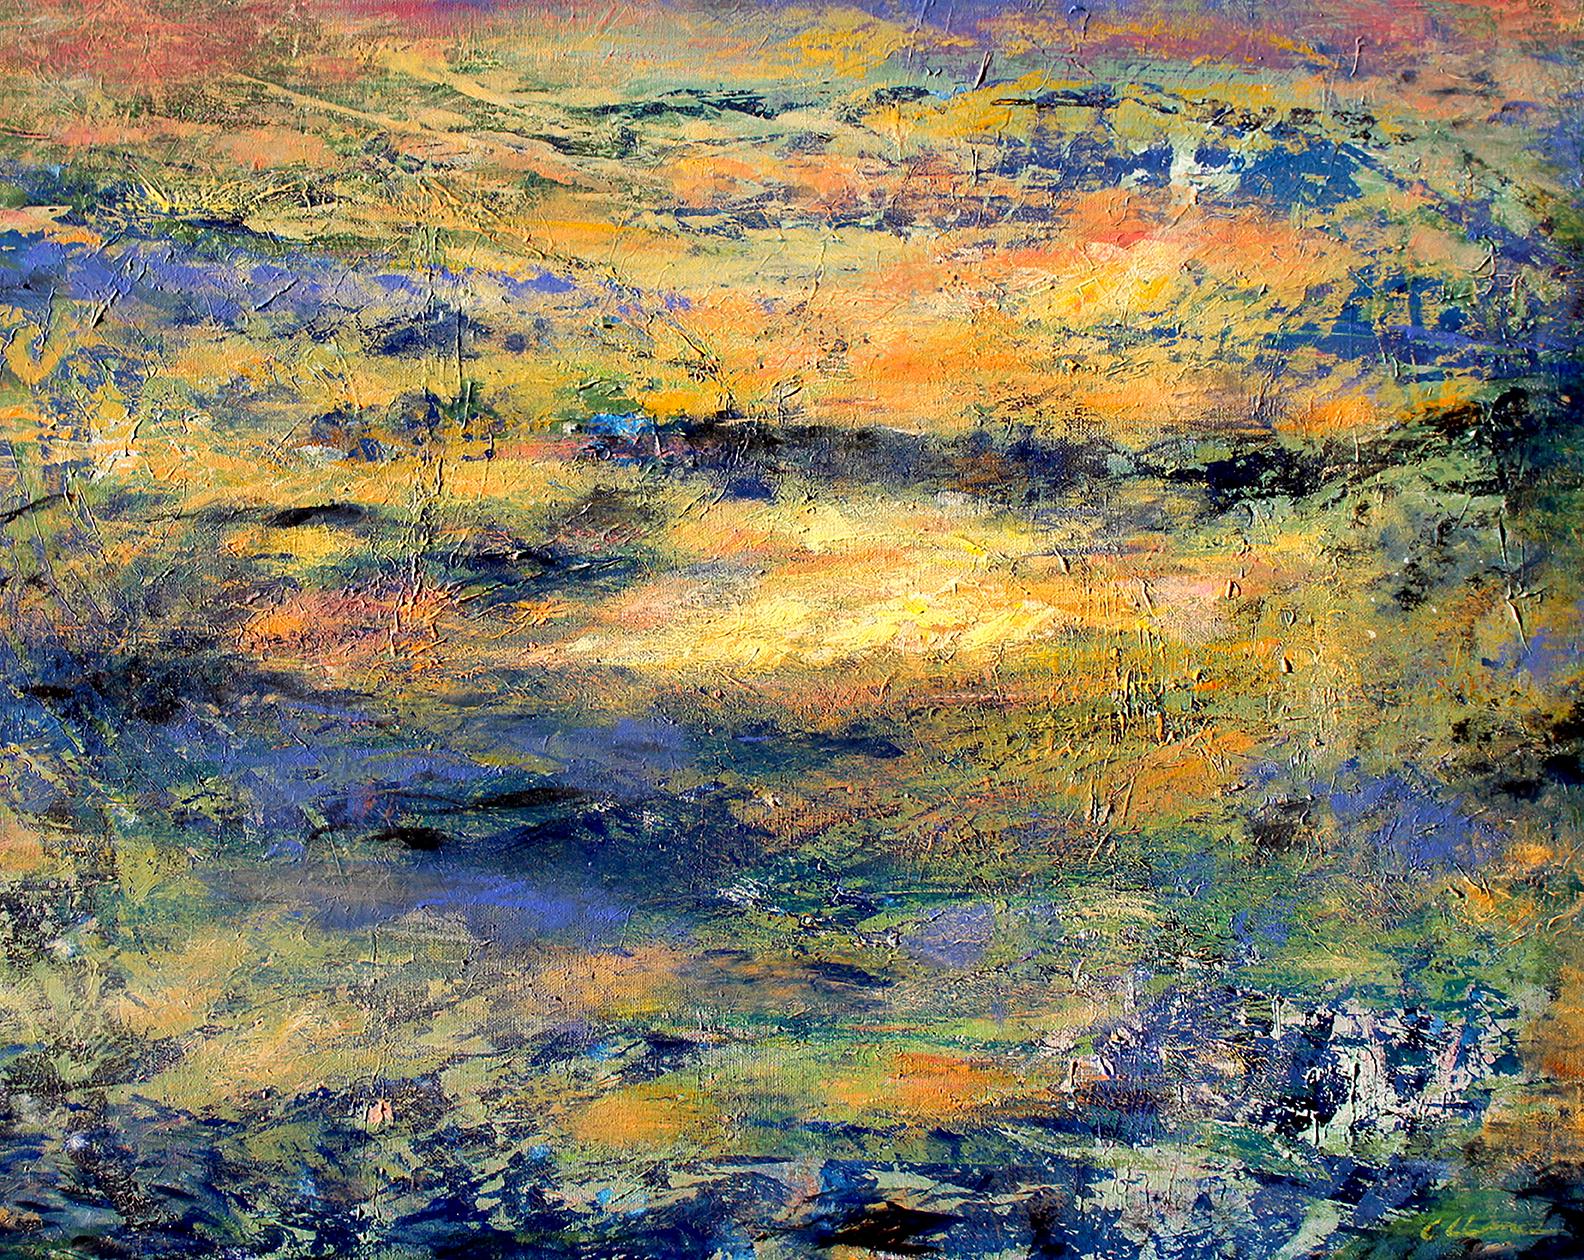 Acrylic Painting of a Sunrise